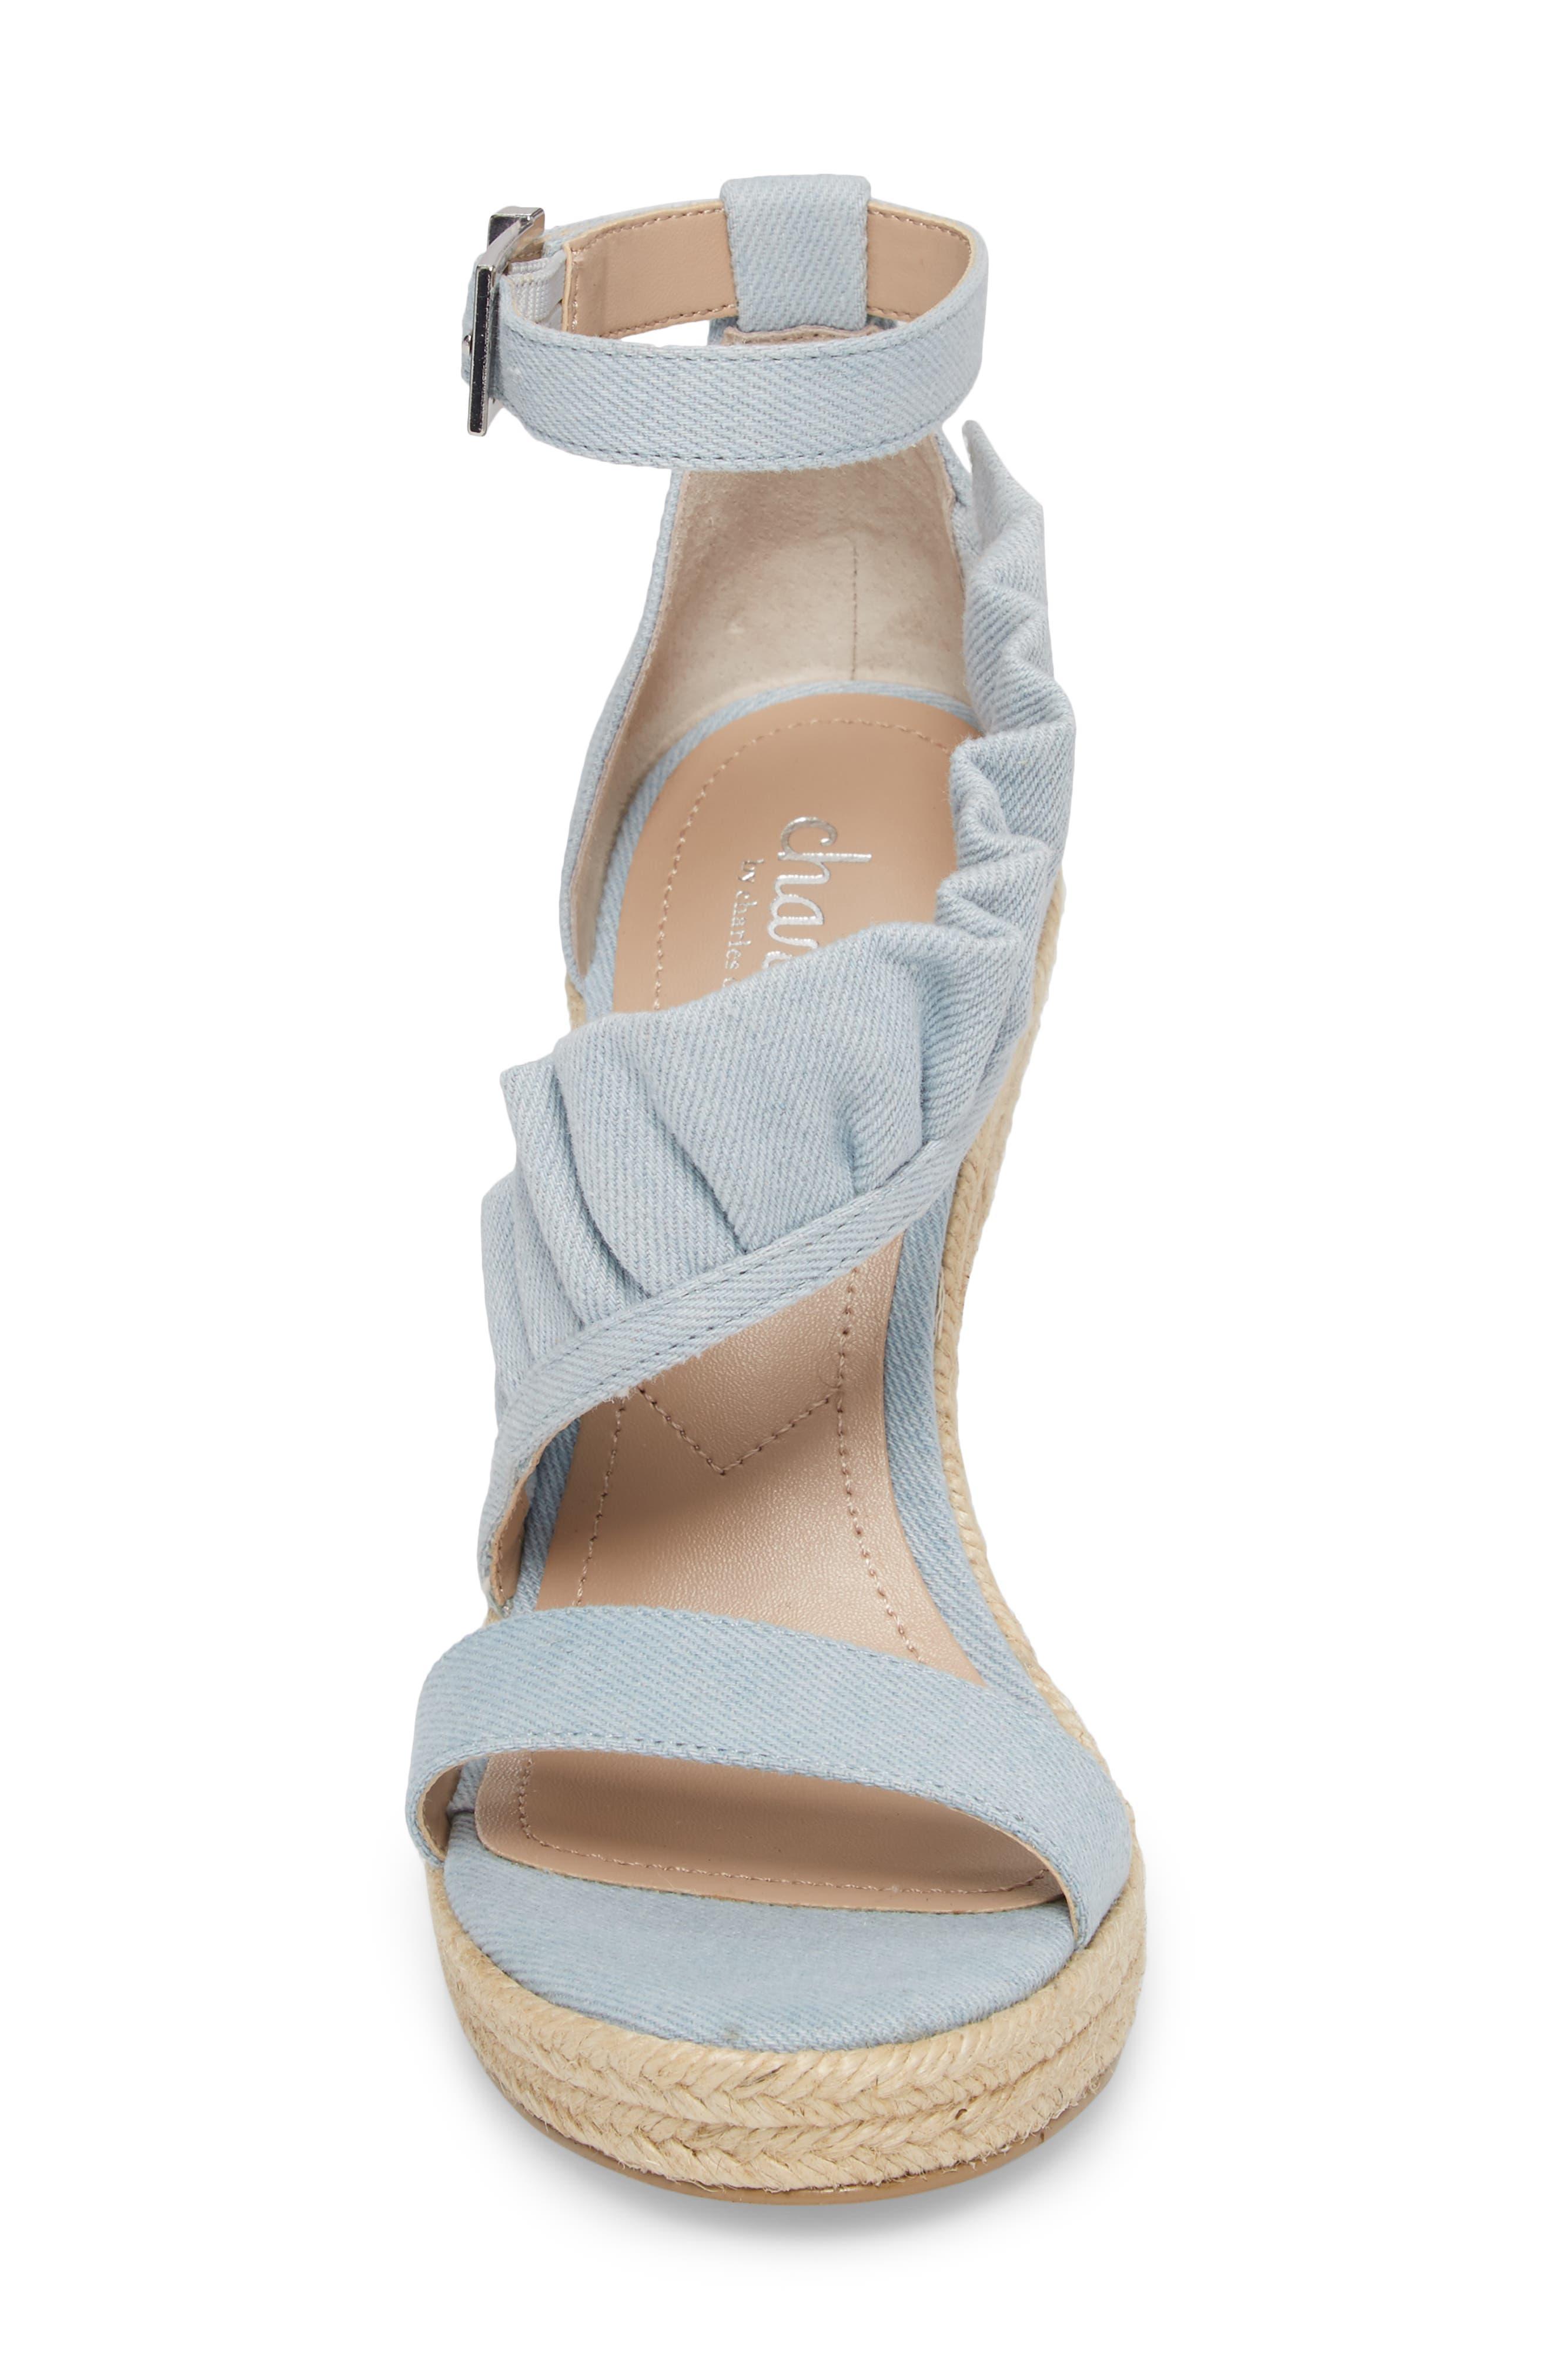 Brooke Espadrille Wedge Sandal,                             Alternate thumbnail 4, color,                             Light Blue Denim